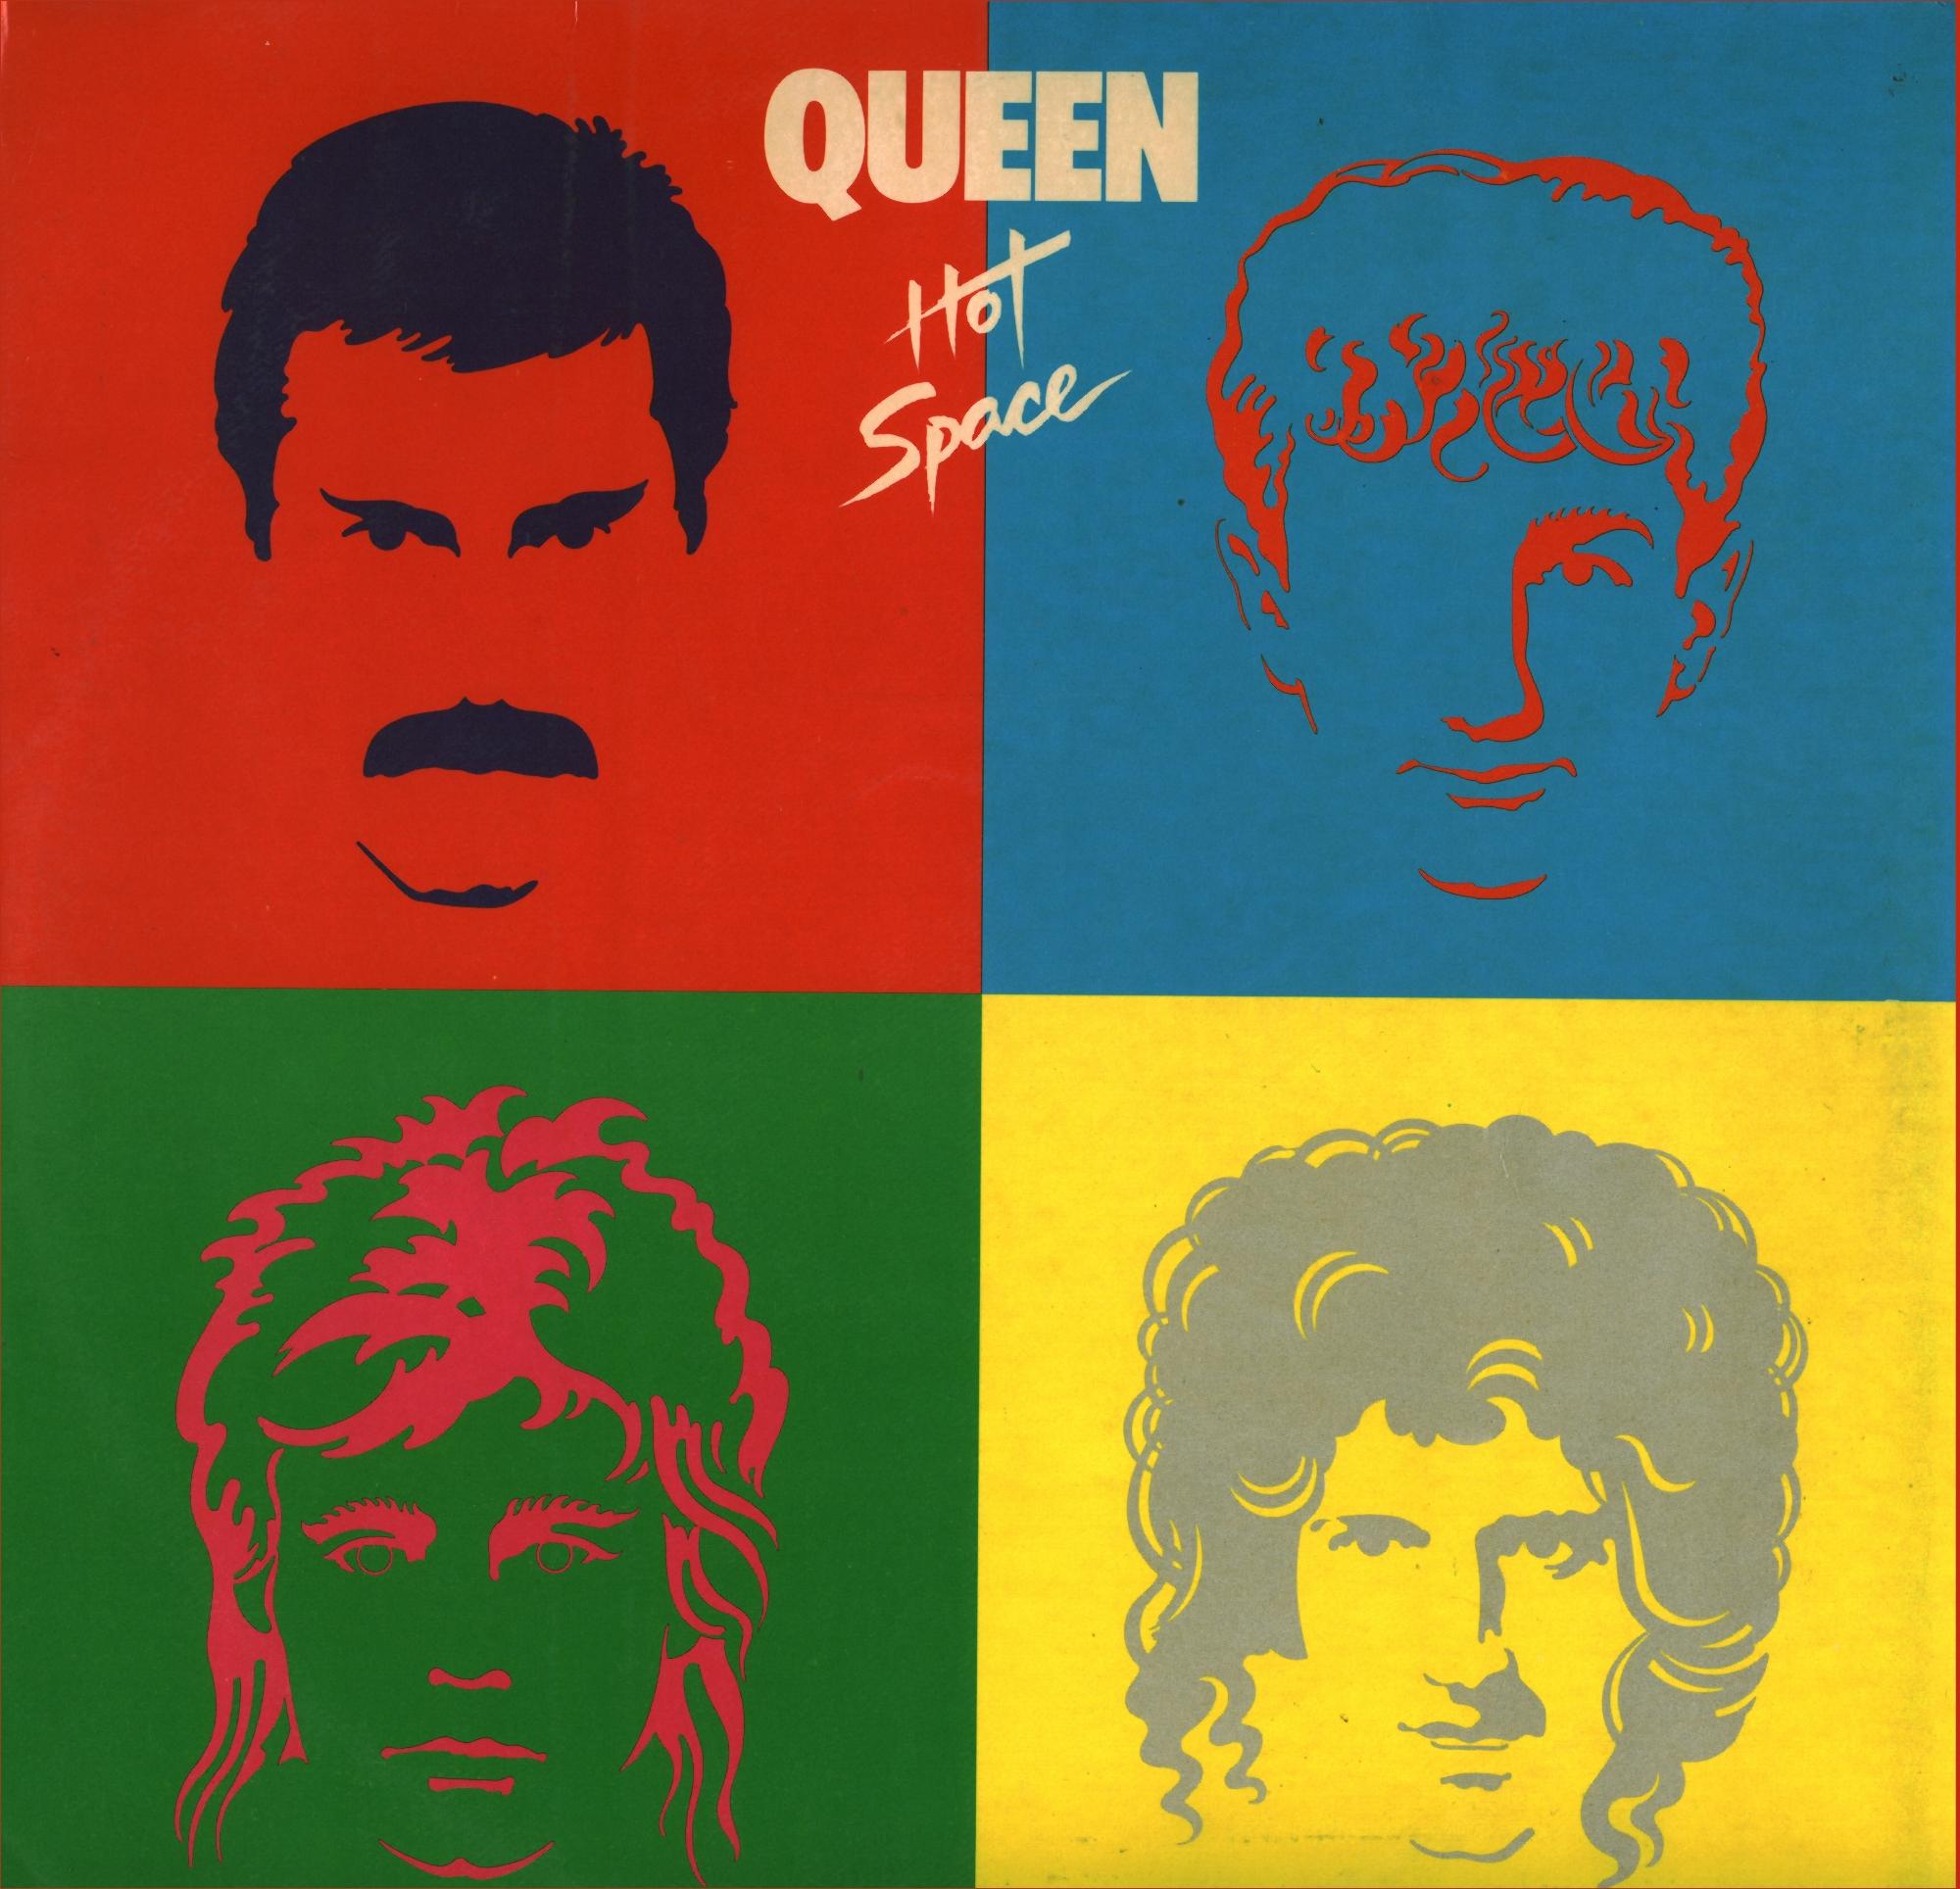 Queen Hot Space Espacio Caliente